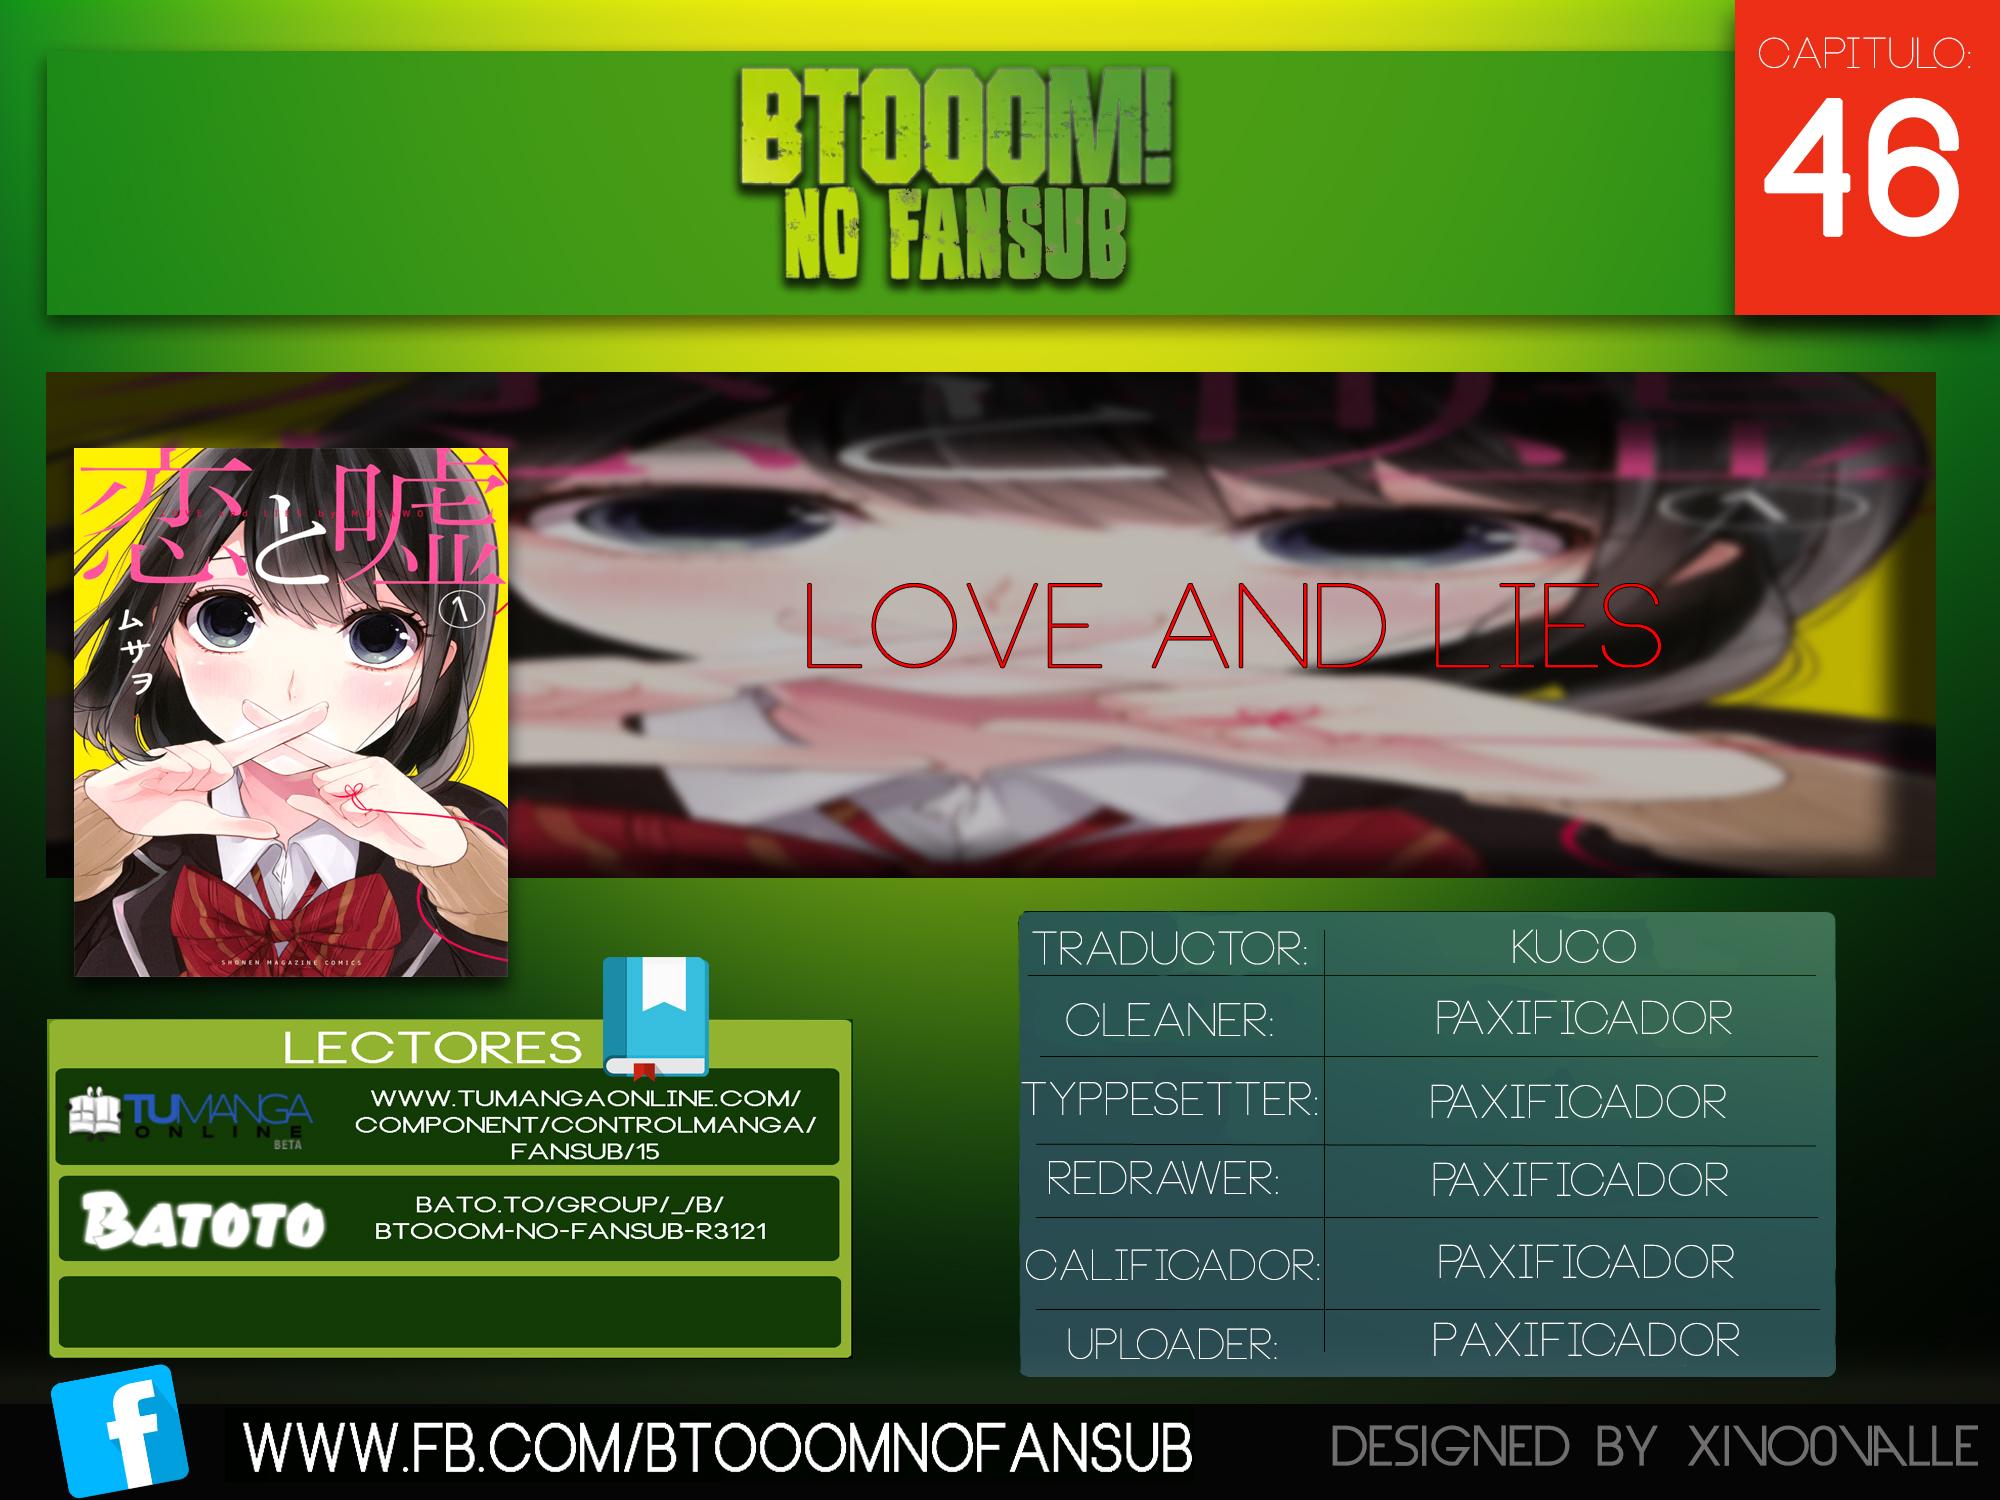 http://c5.ninemanga.com/es_manga/14/14734/392912/f10f9c3091f282e0581b37028e7a0a2b.jpg Page 1